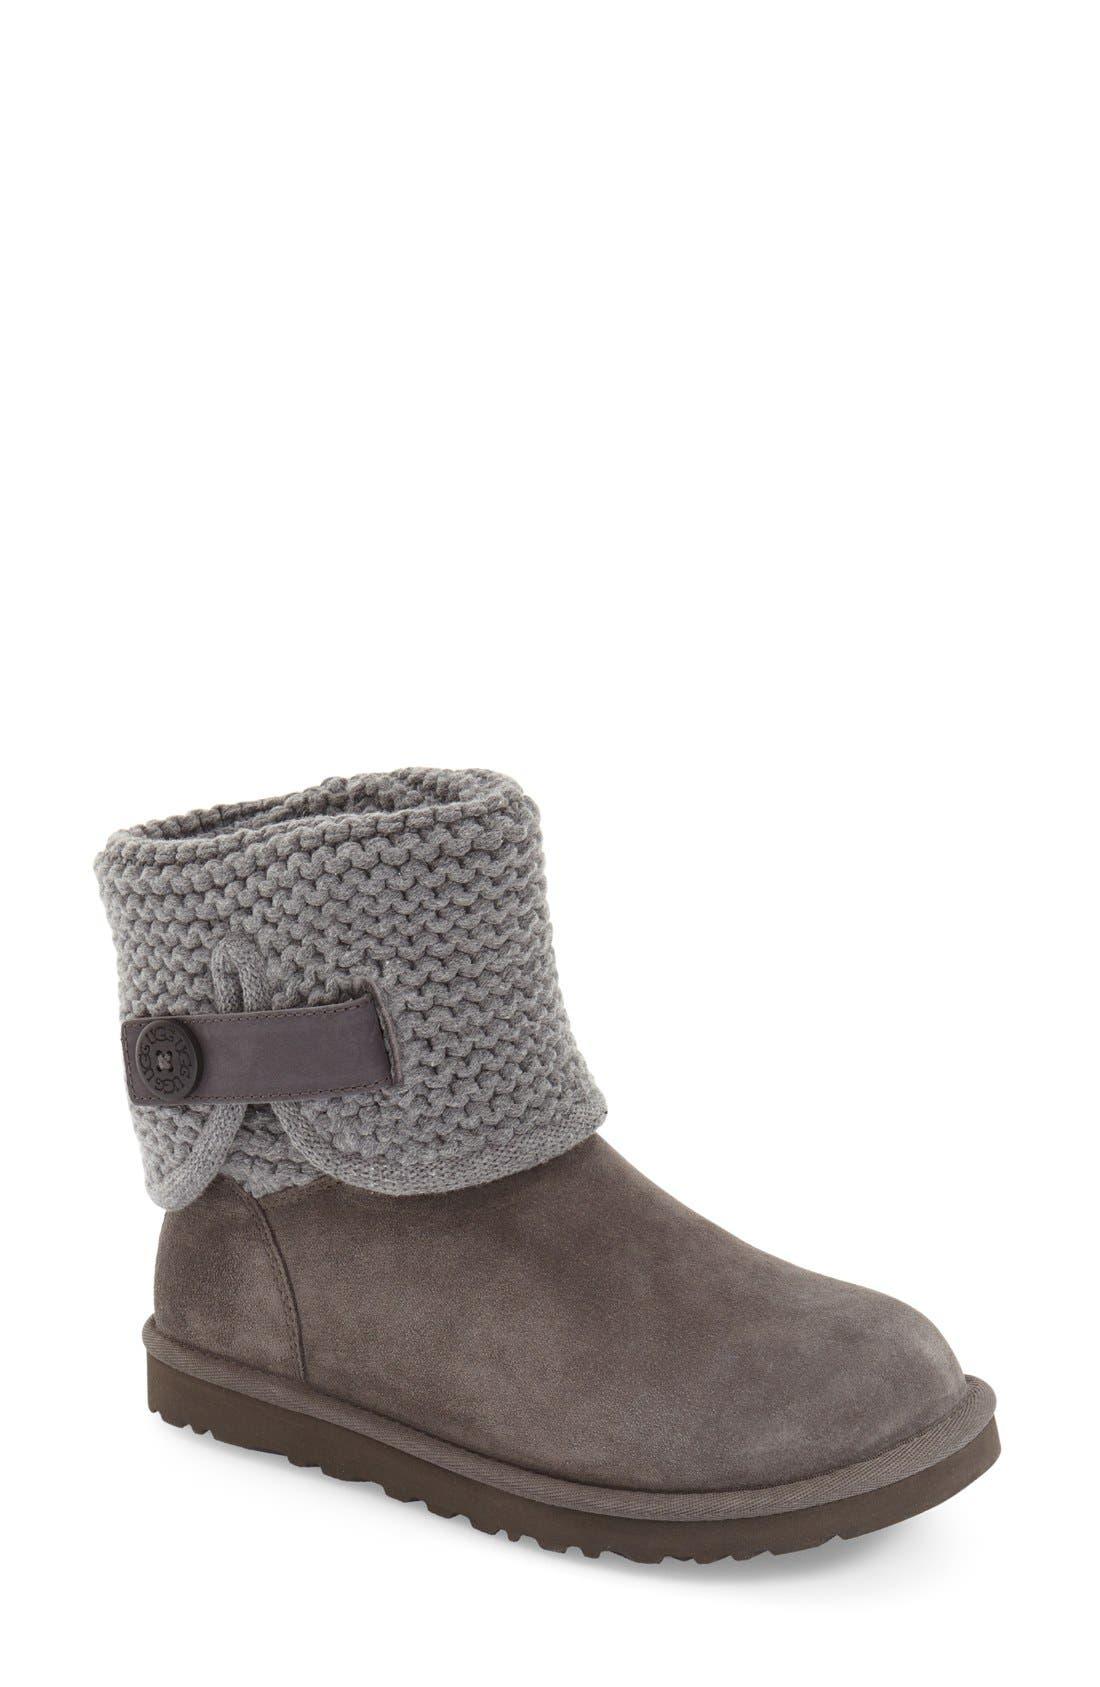 Main Image - UGG® Shaina Knit Cuff Bootie (Women)